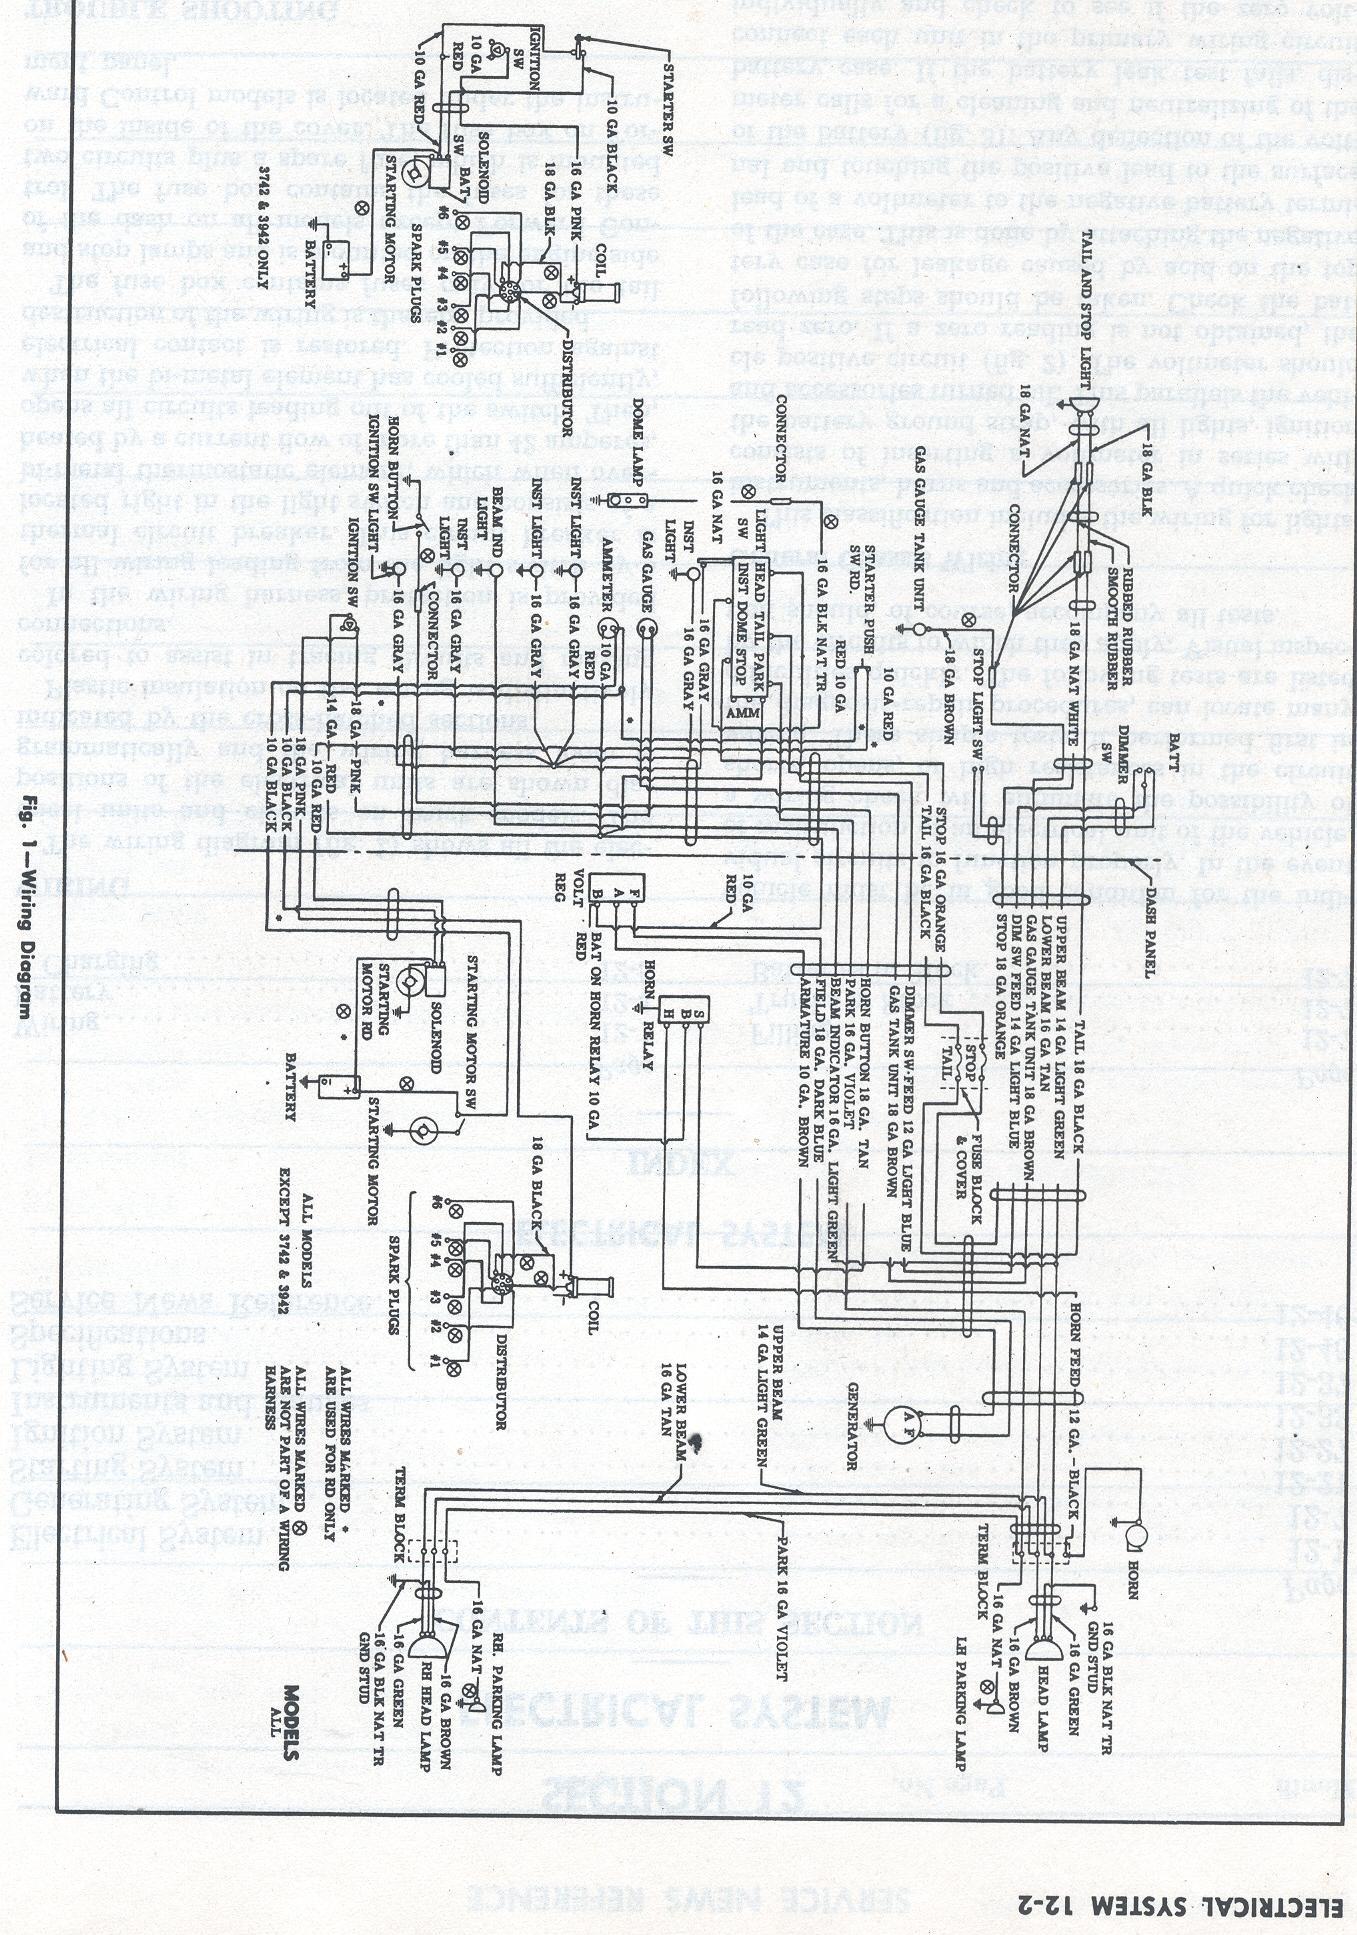 chevytruck1954shopmanualwiring